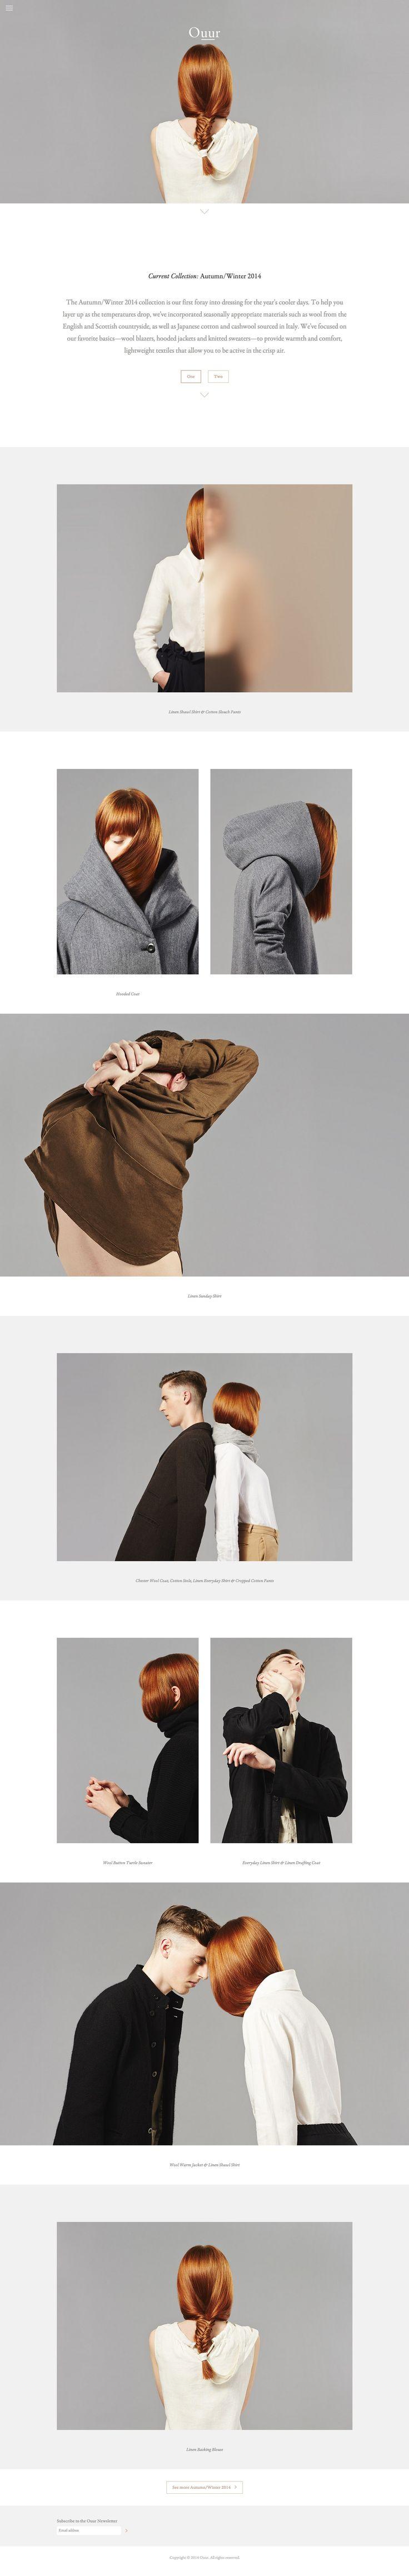 best web ui ux images on pinterest brand design graphics